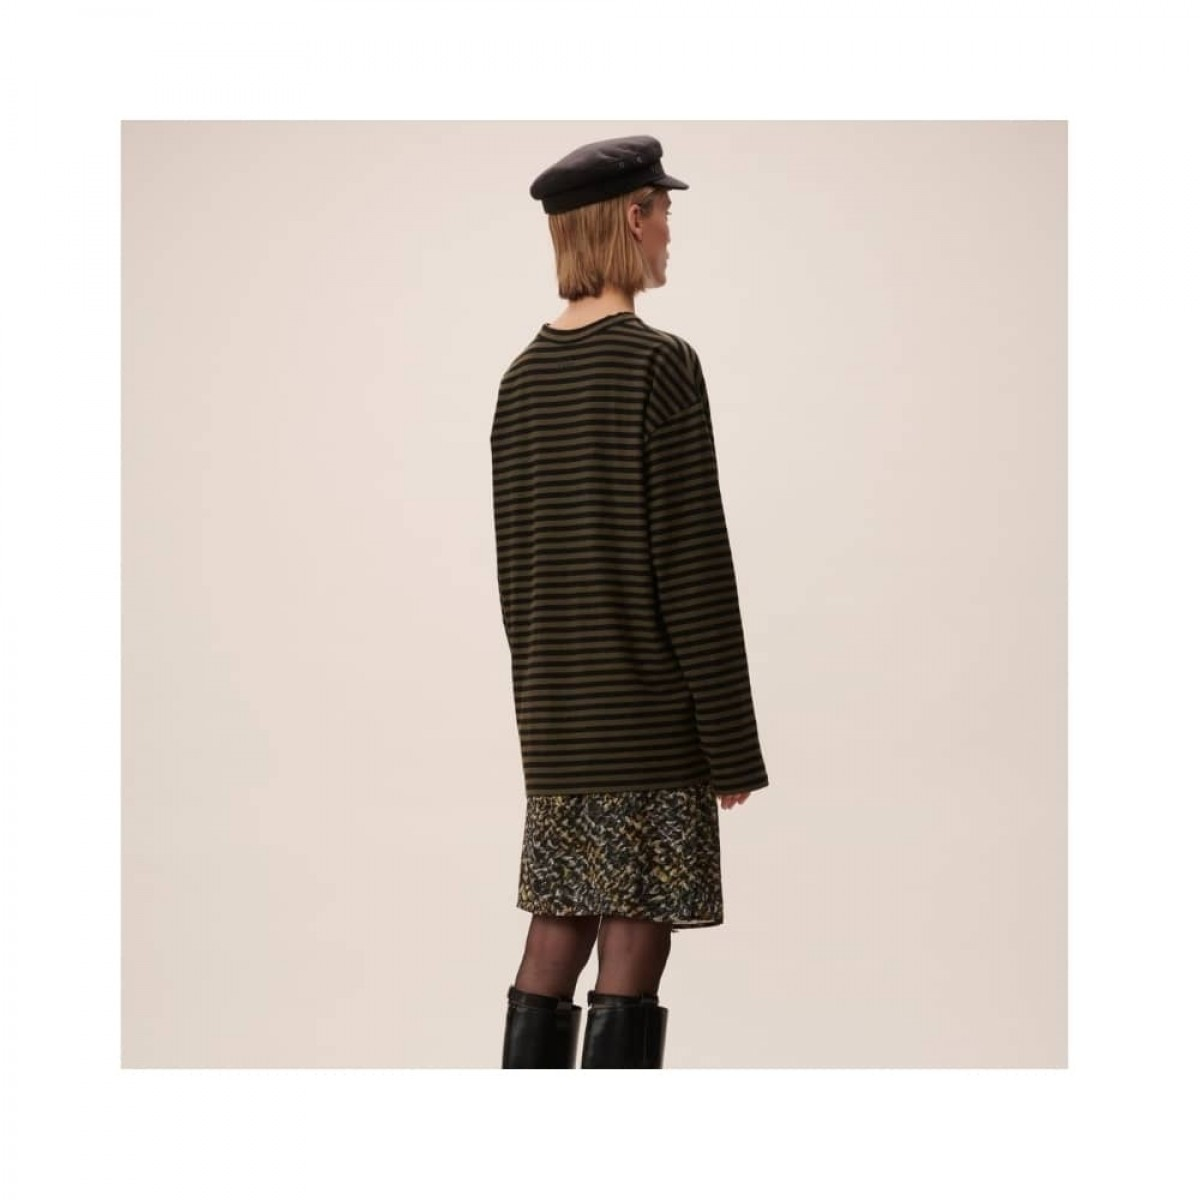 igori longsleeve tee - olive - model ryggen